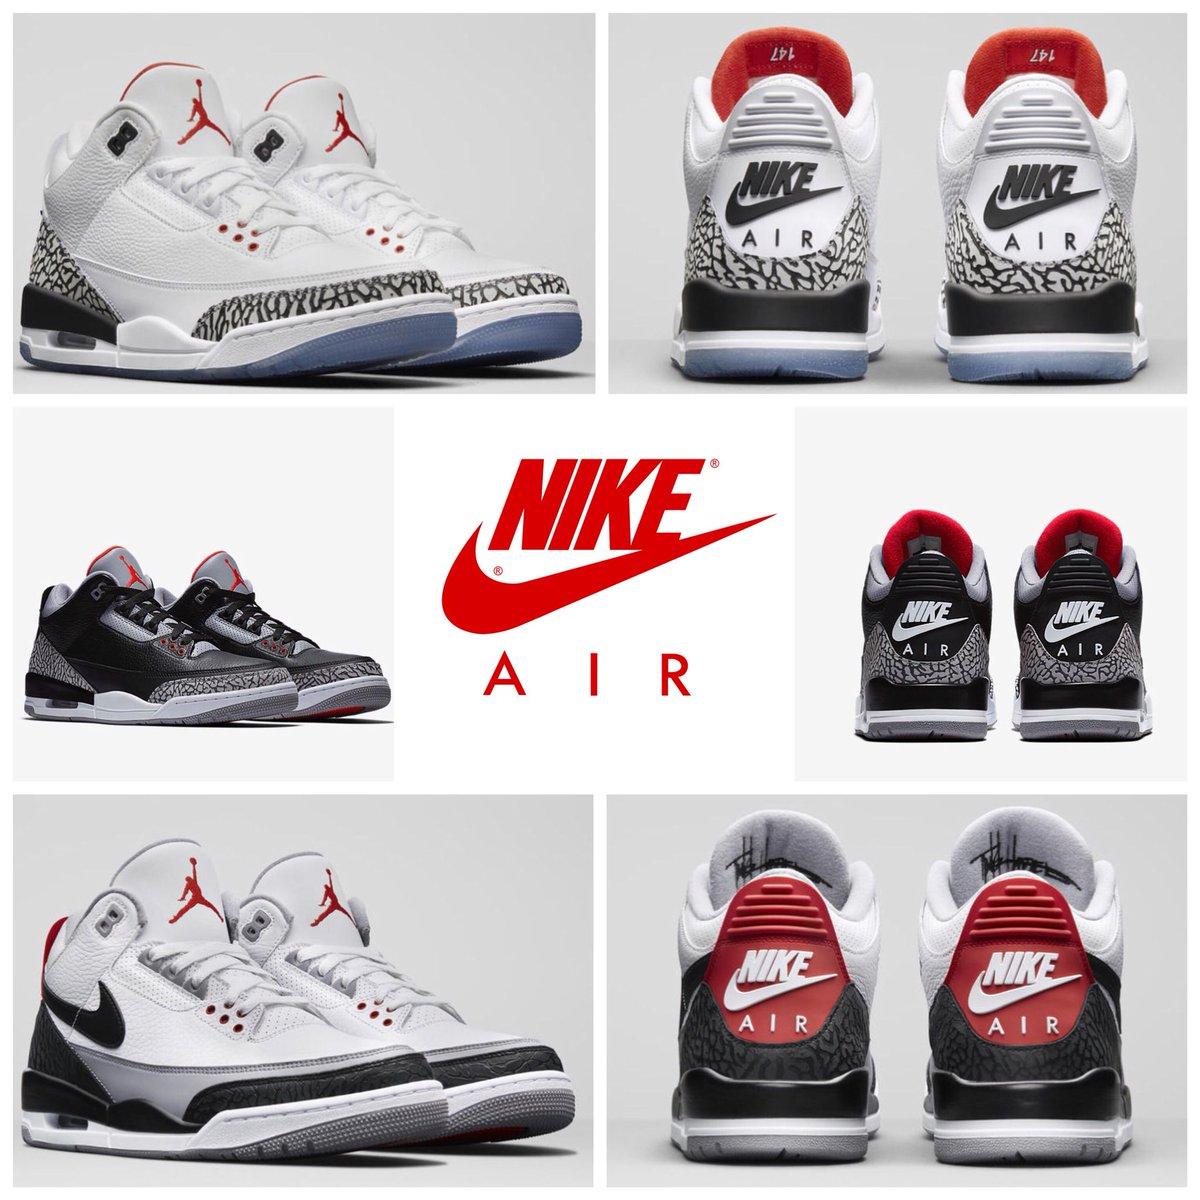 ... official store snkrtwitr on twitter jordan 3 nike air 2 14 1988 dunk  contest 200 2 e8988d0ba